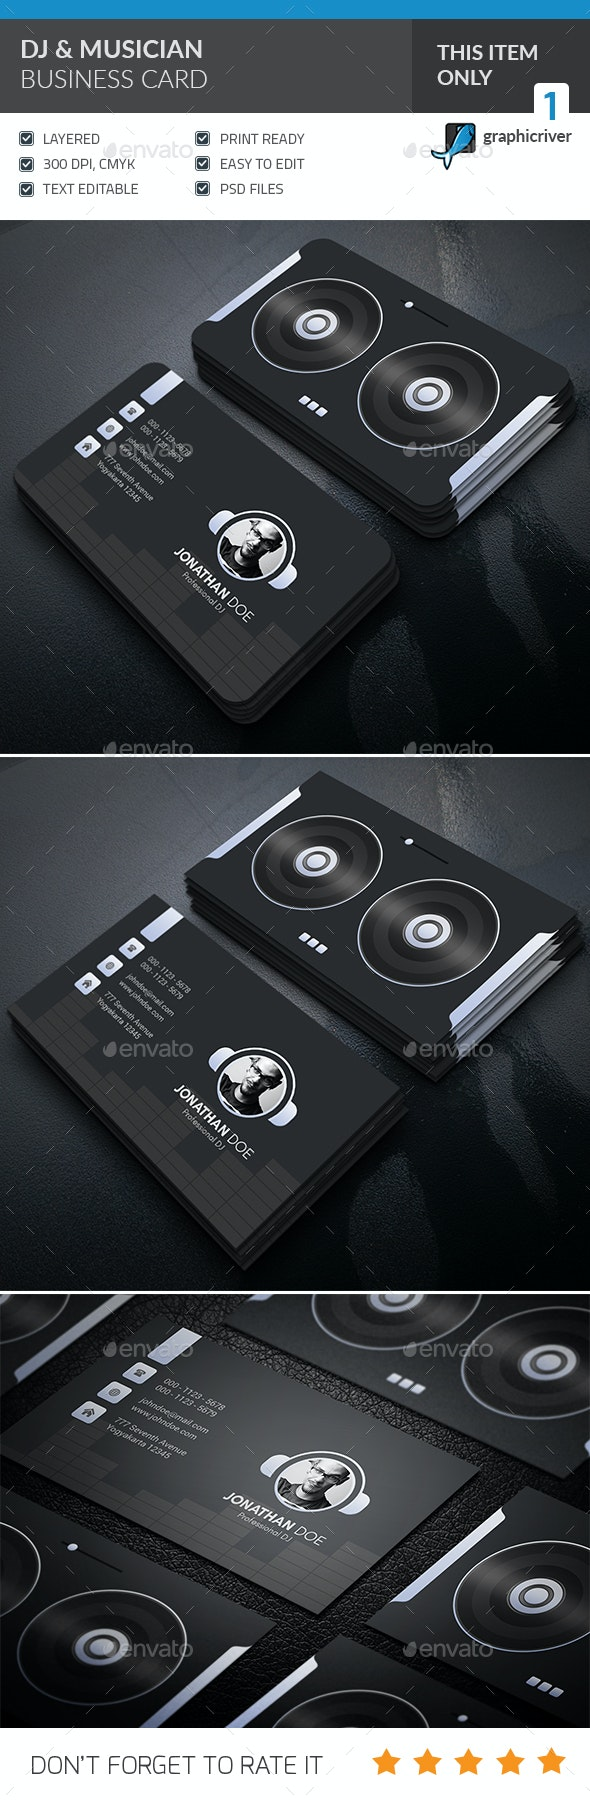 DJ & Musician Business Card  - Corporate Business Cards